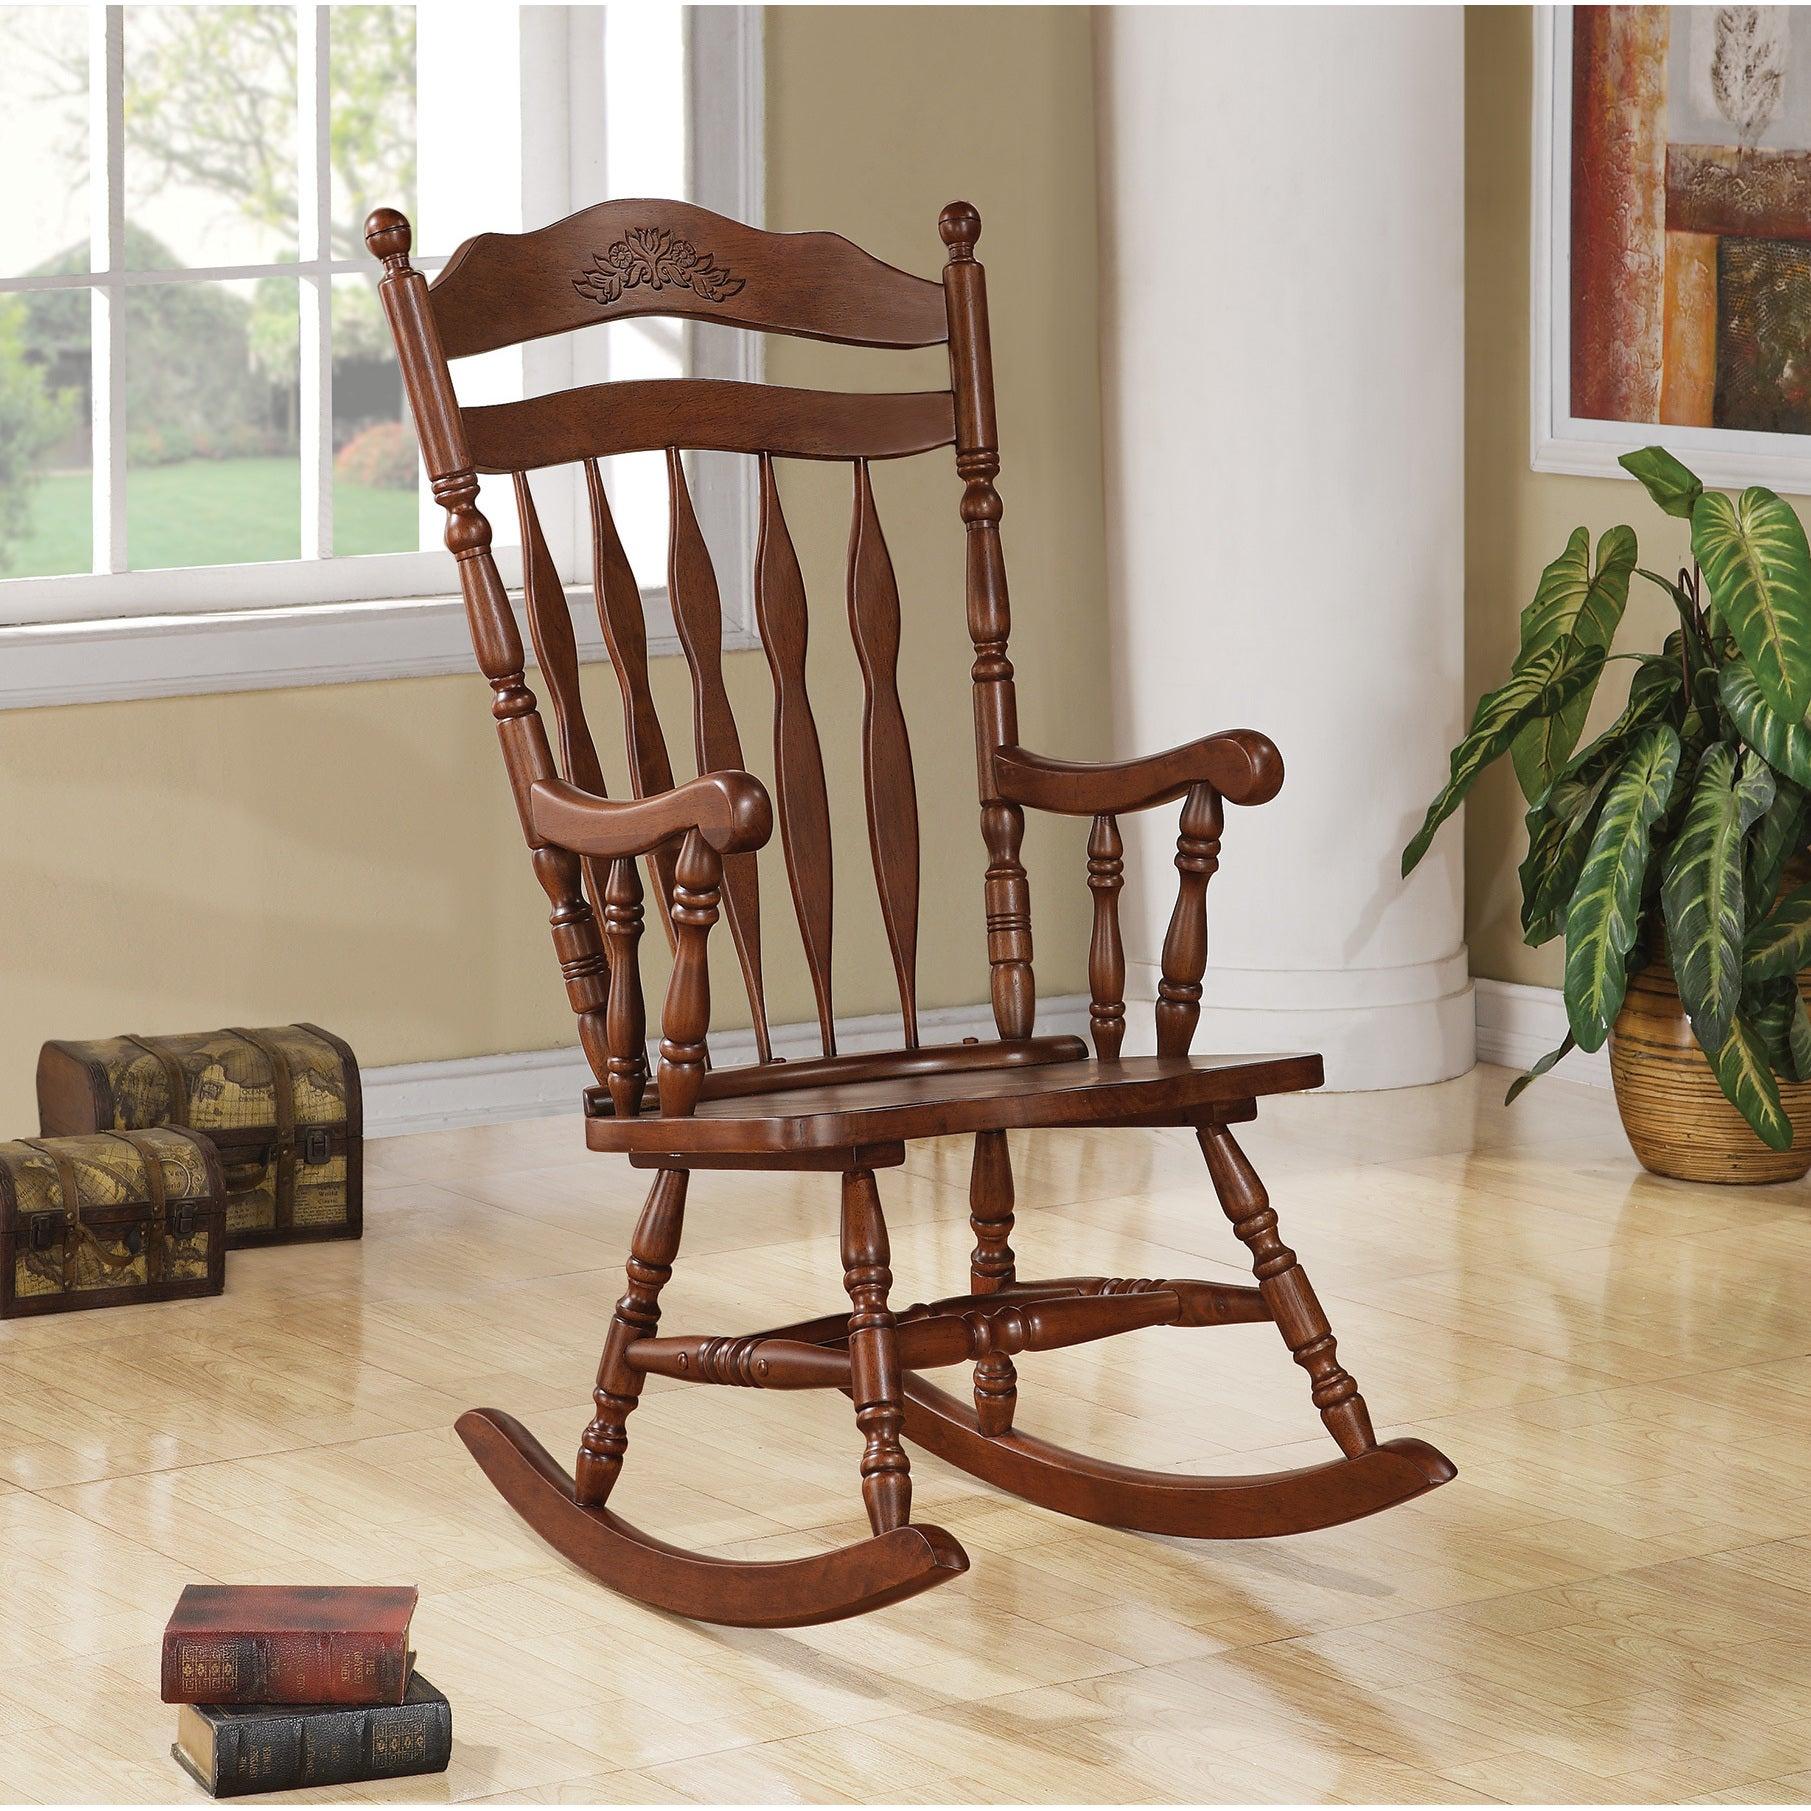 Copper Grove Cranesbill Walnut Wood Rocking Chair Pertaining To Walnut Wood Rocking Chairs (View 4 of 20)